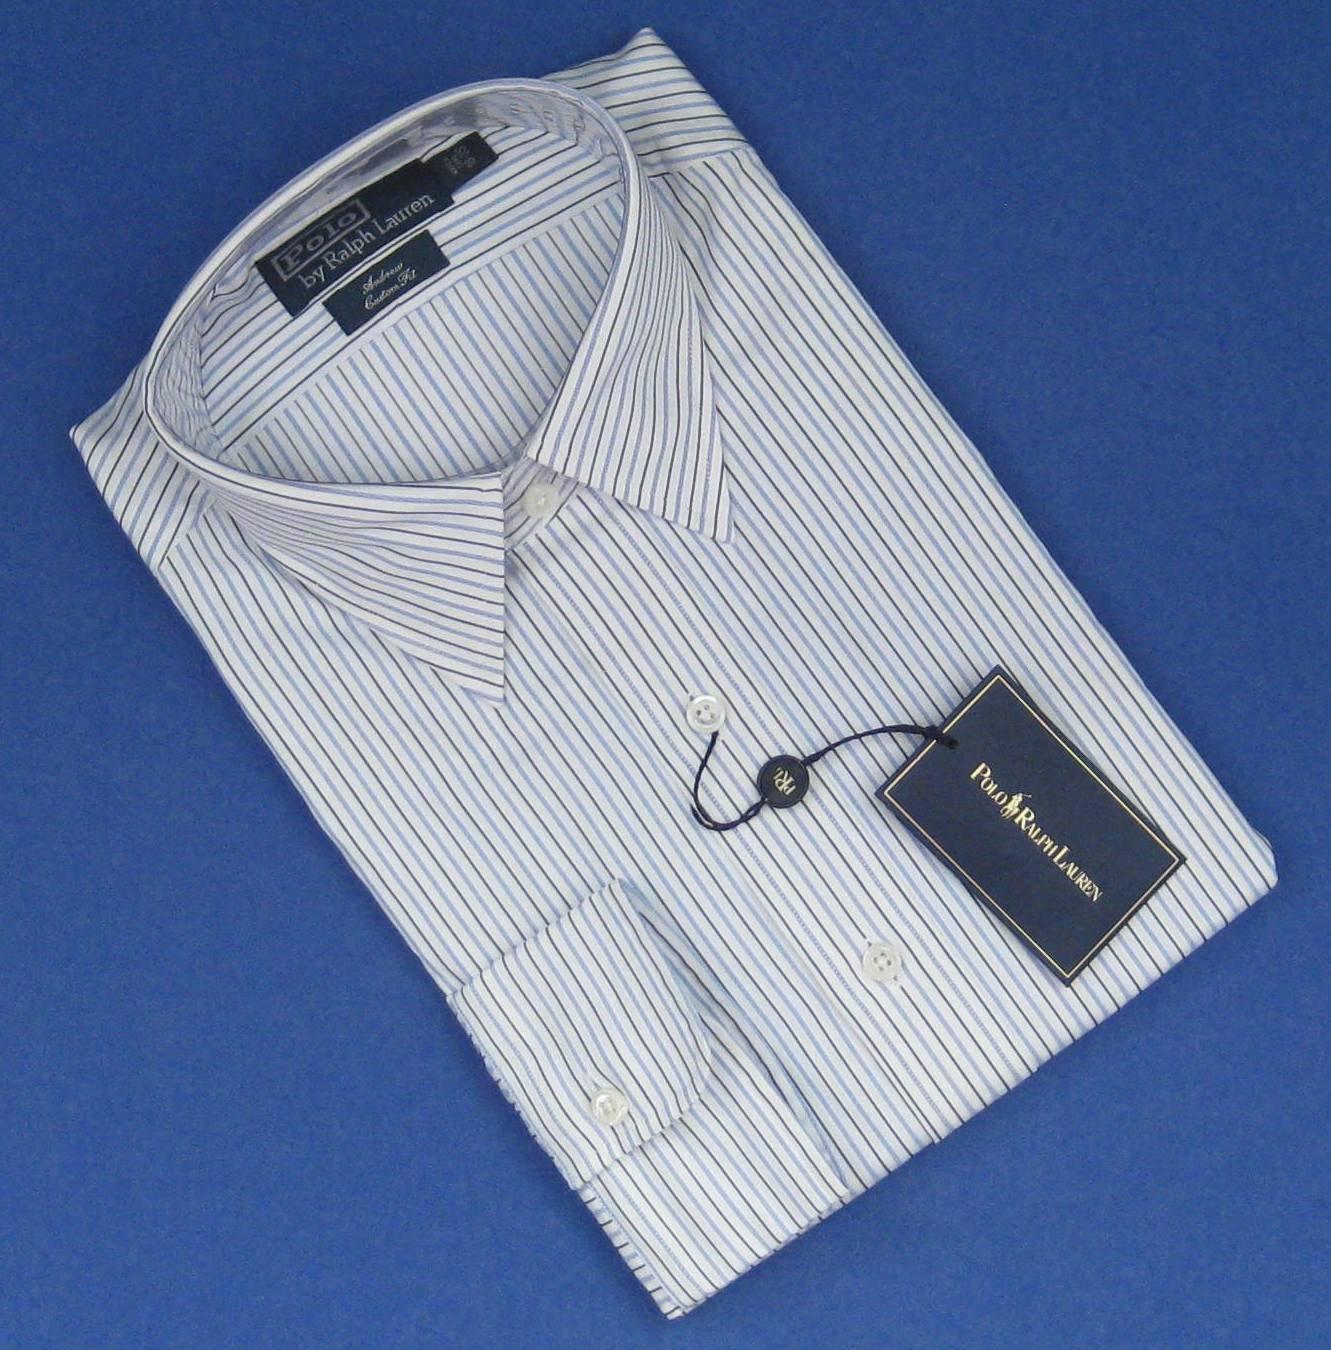 NWT Polo Ralph Lauren White w/Blue & Black Stripe Andrew Custom Fit Dress Shirt - 16/35